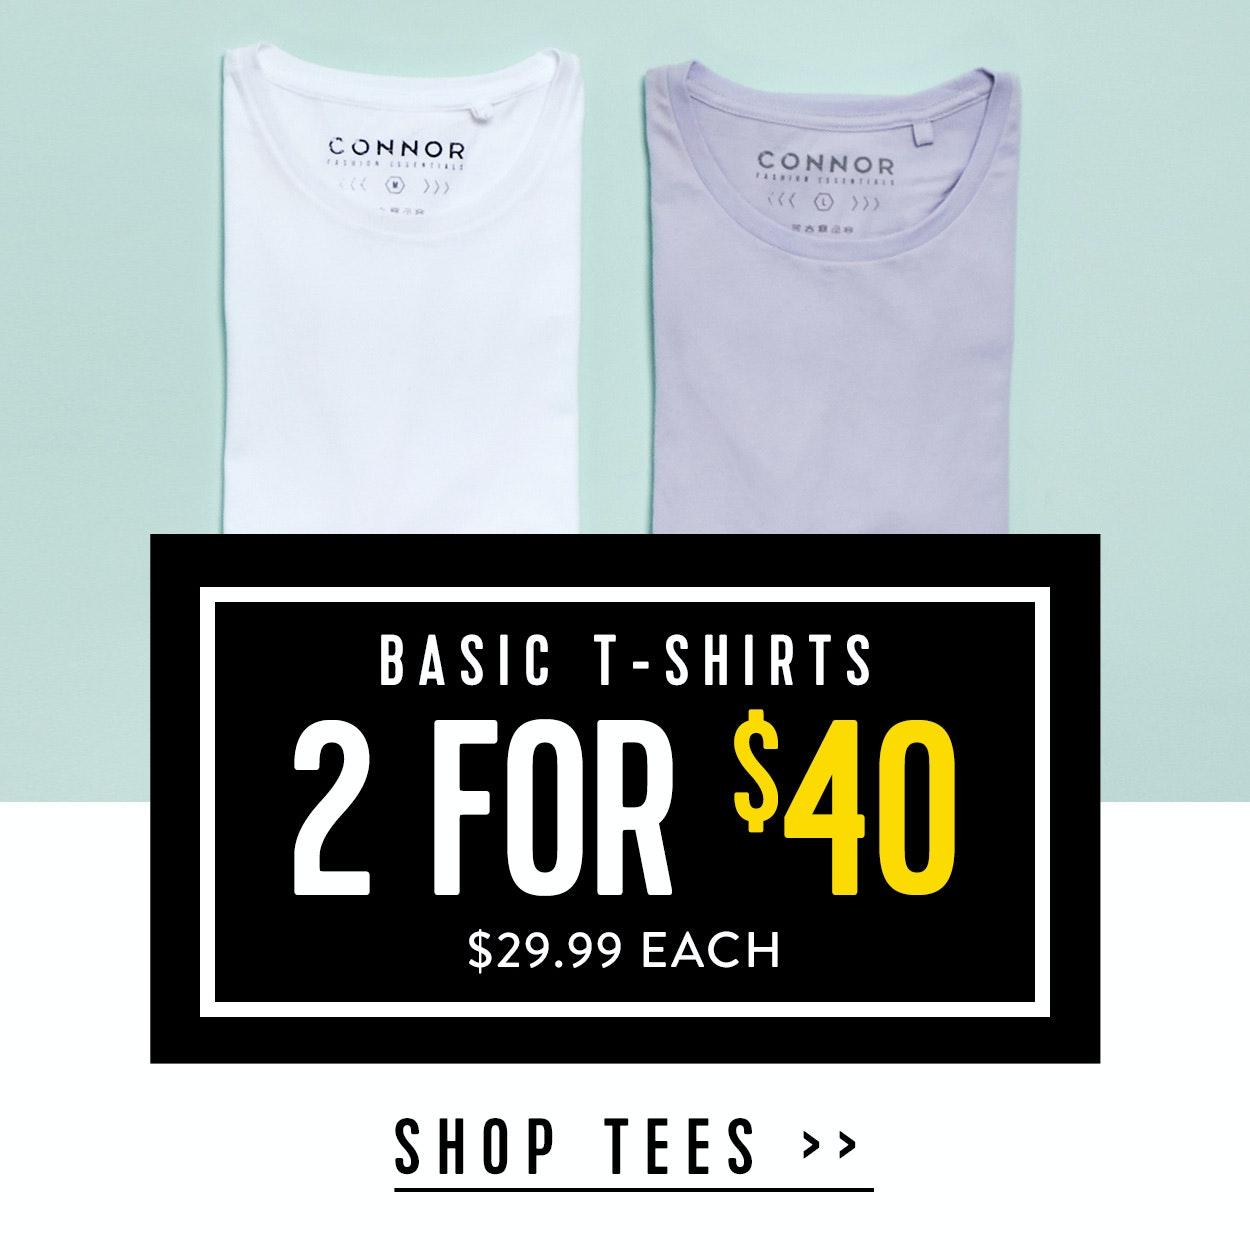 Shop Menswear Sale T-shirts at Connor